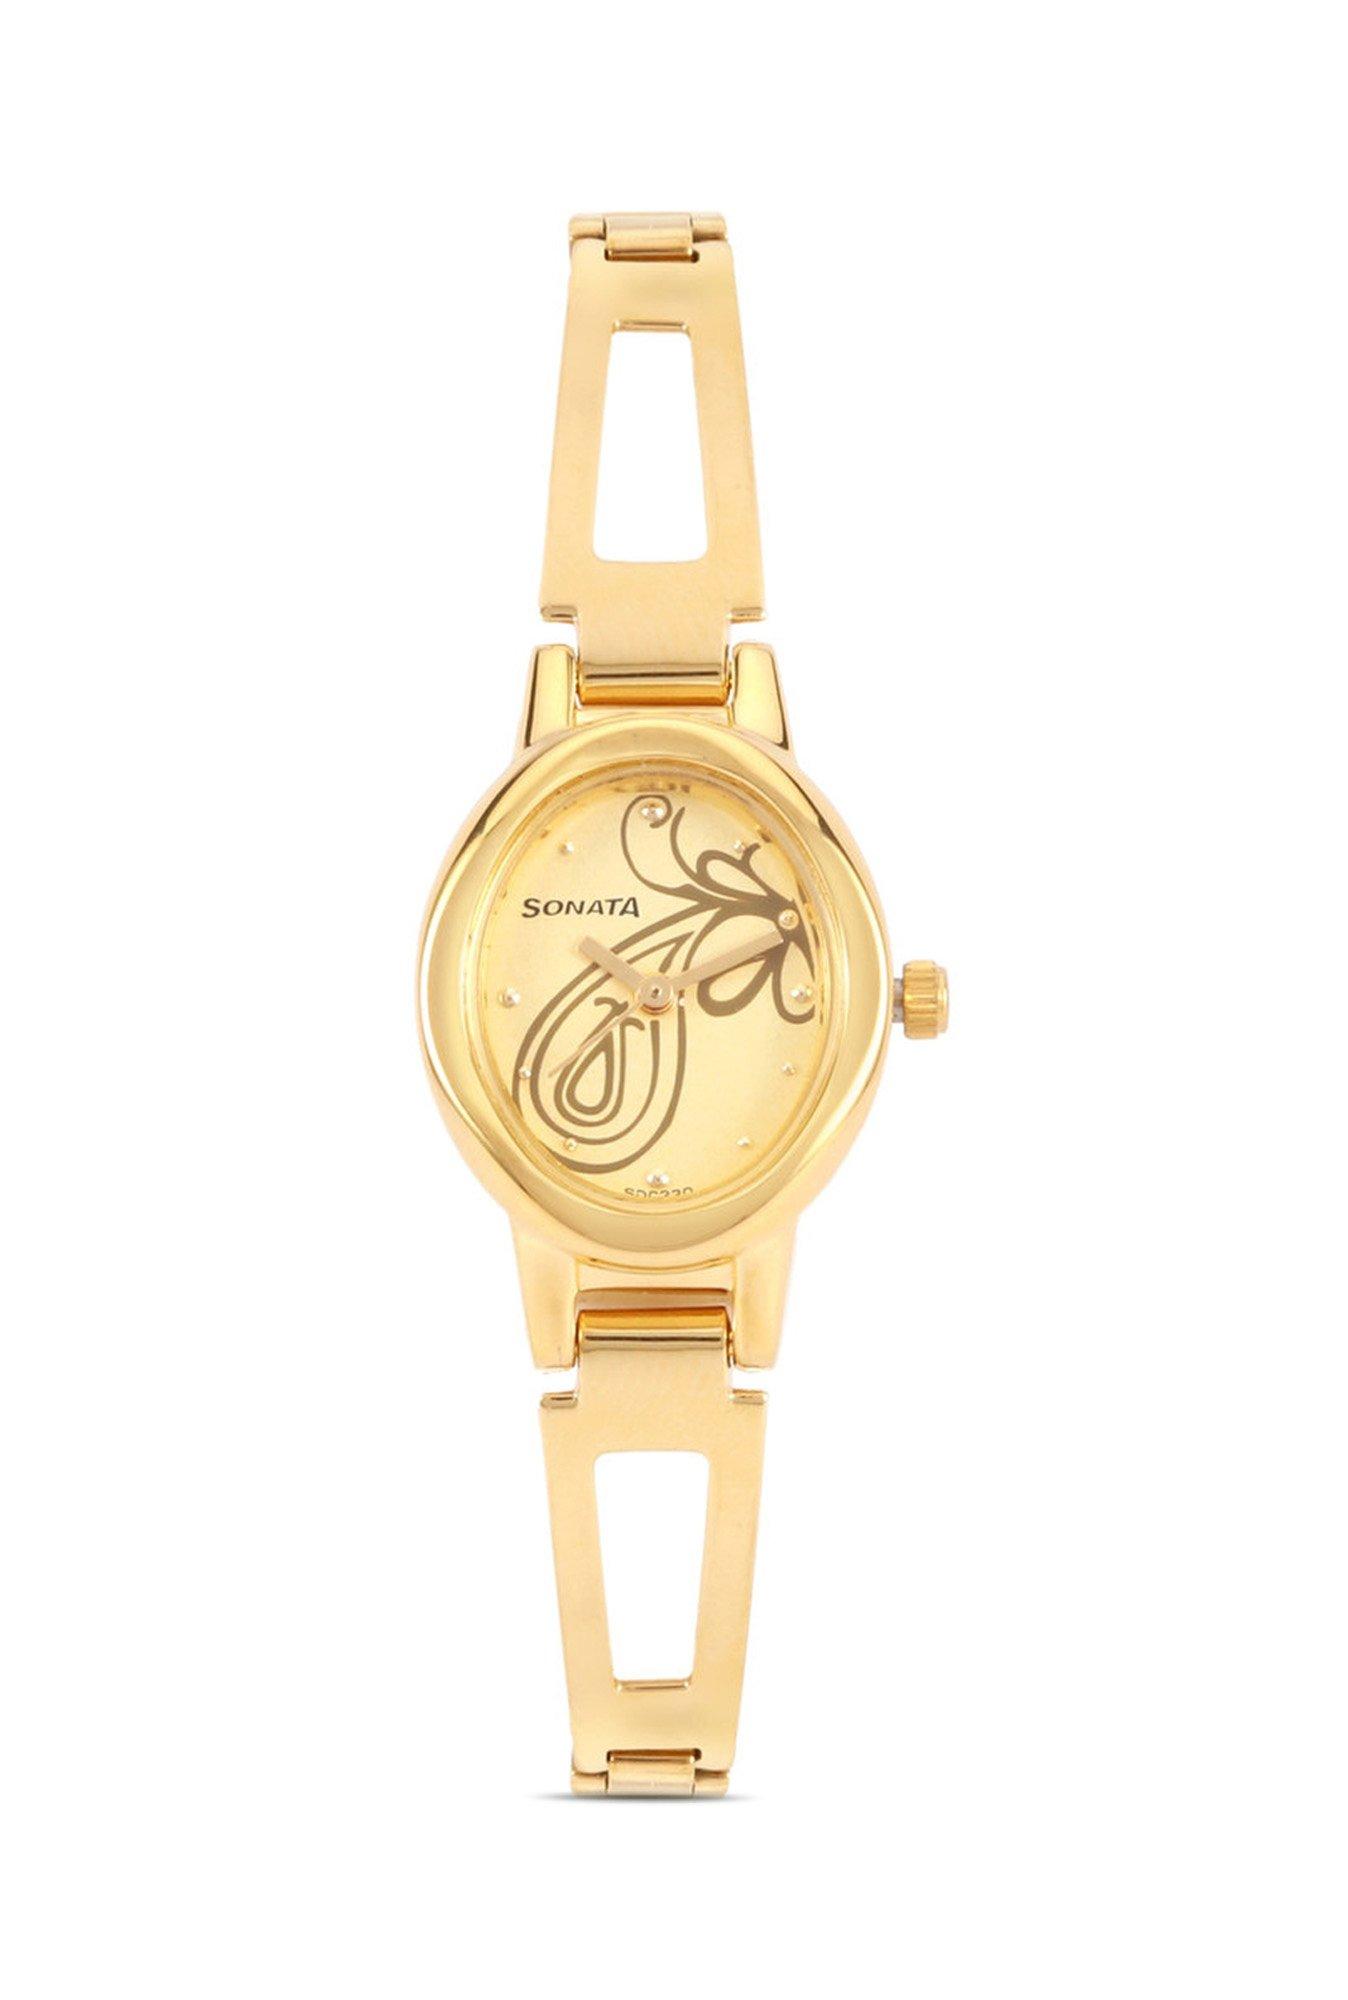 Sonata 8085YM01 Everyday Analog Champagne Dial Women's Watch (8085YM01)